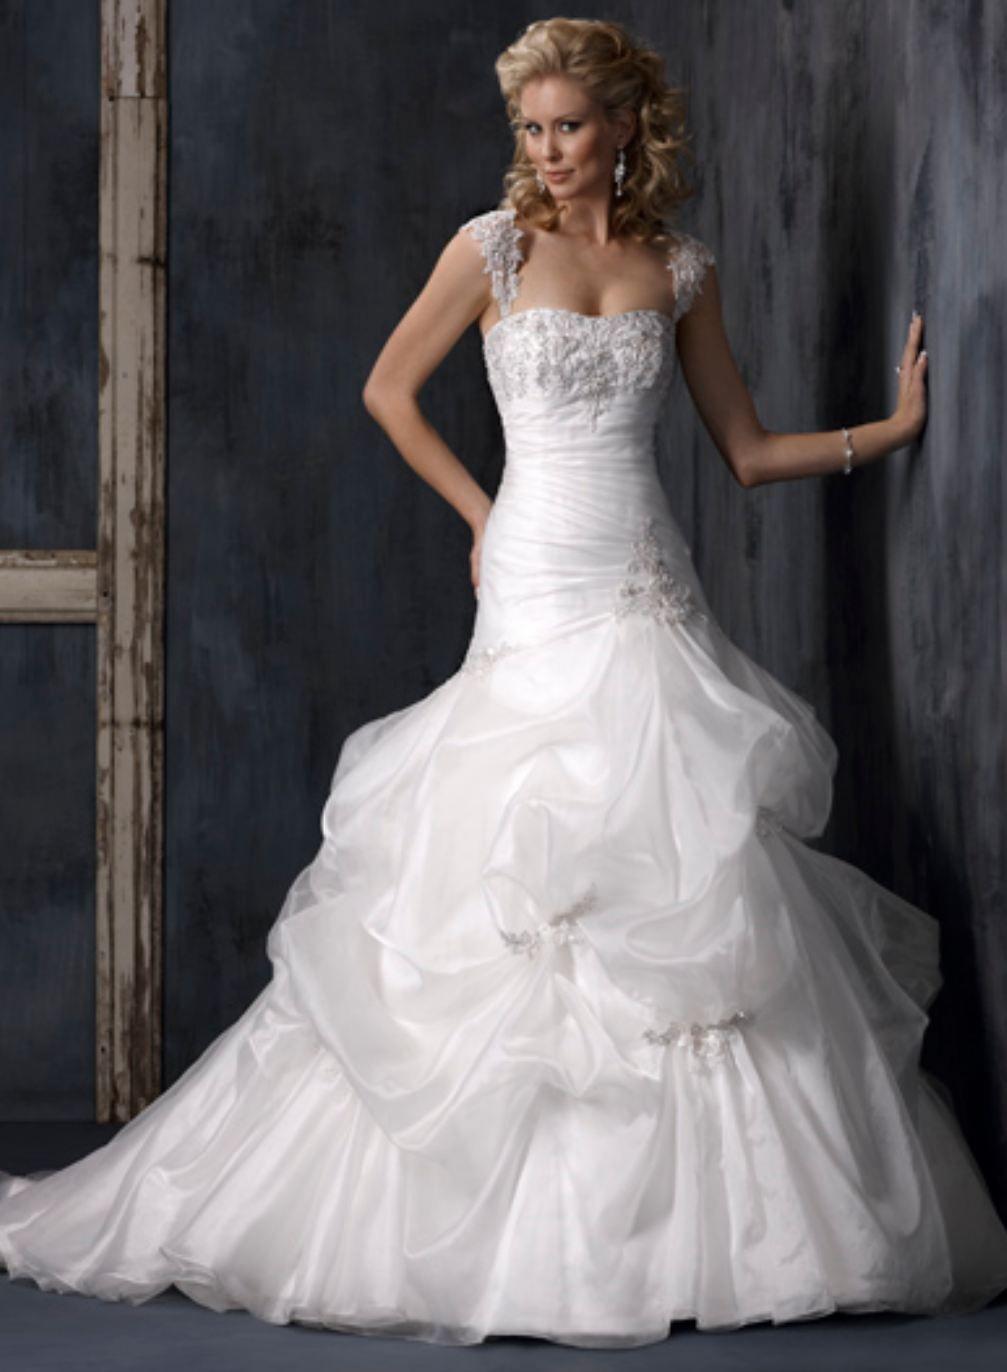 Different color wedding dresses  Mon Cheri Ashley Bridal Gown  Wedding Inspiration  Pinterest